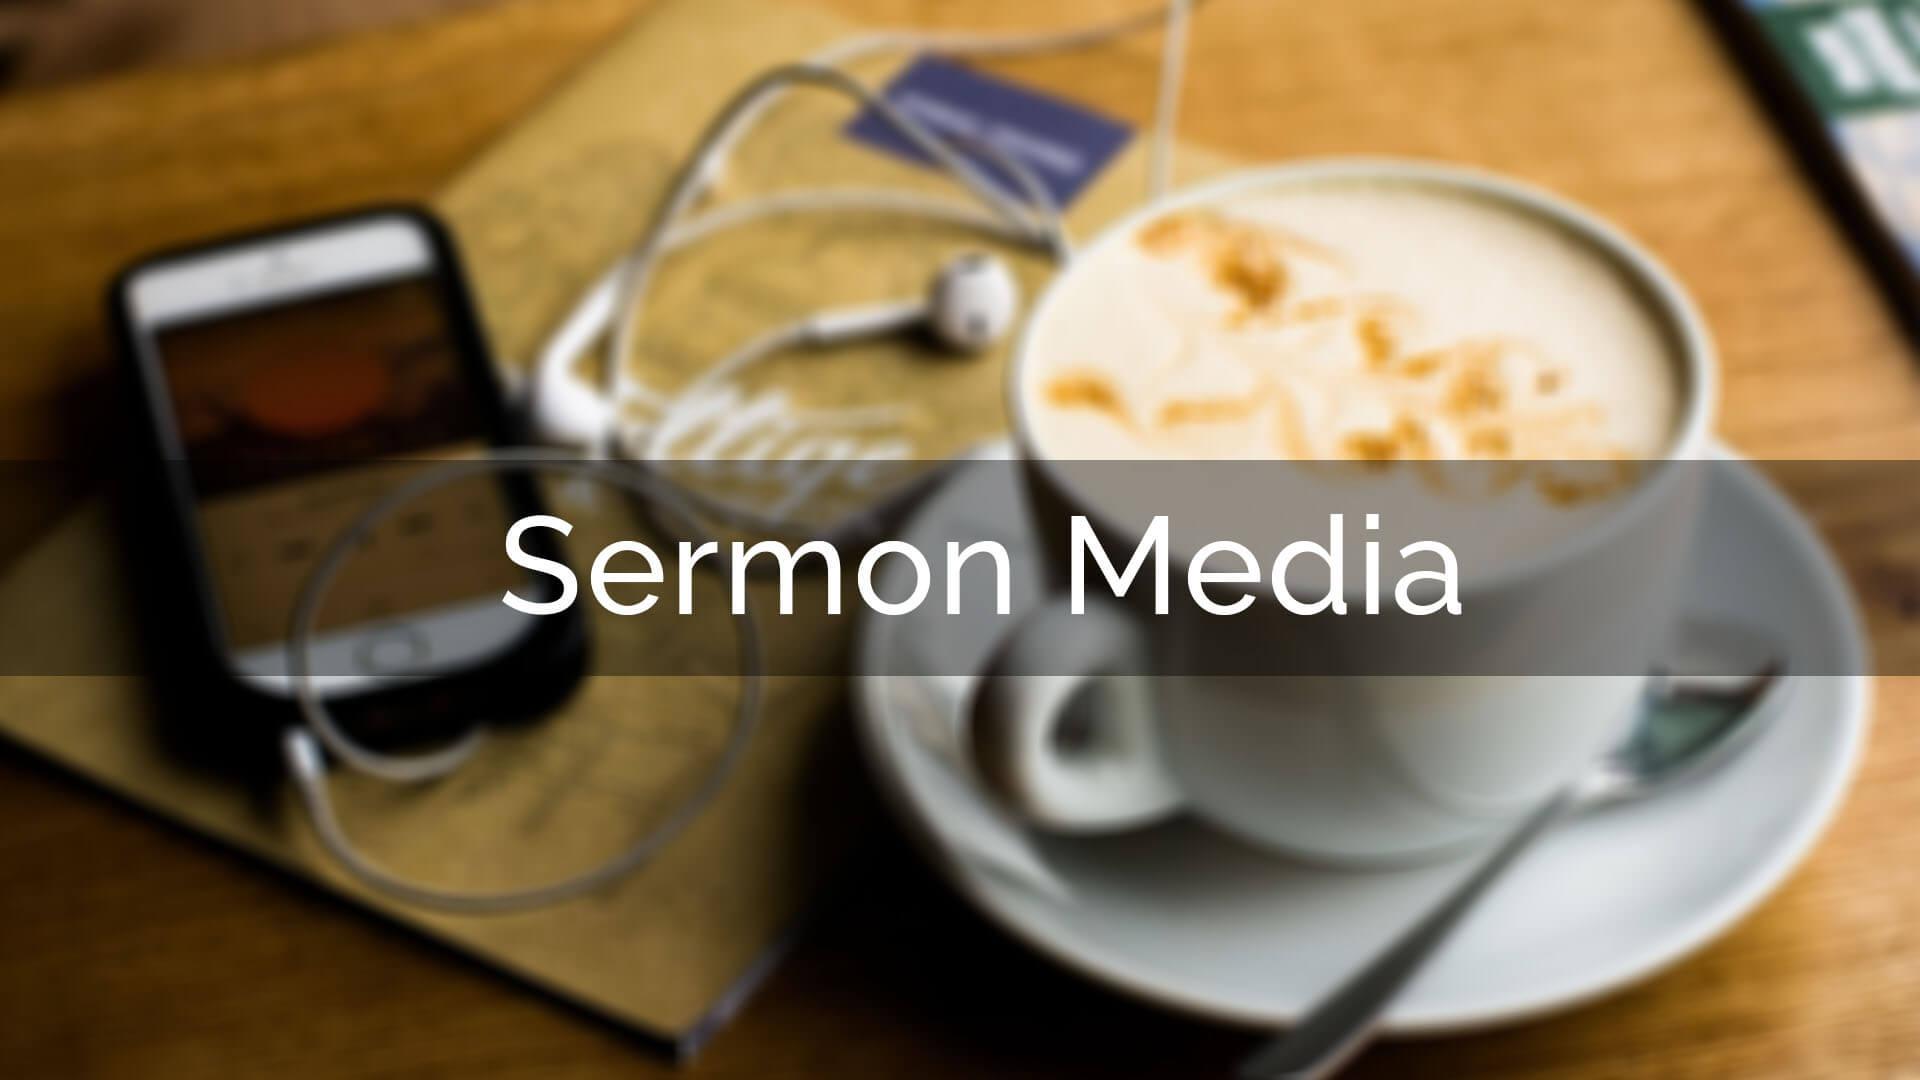 SermonMedia